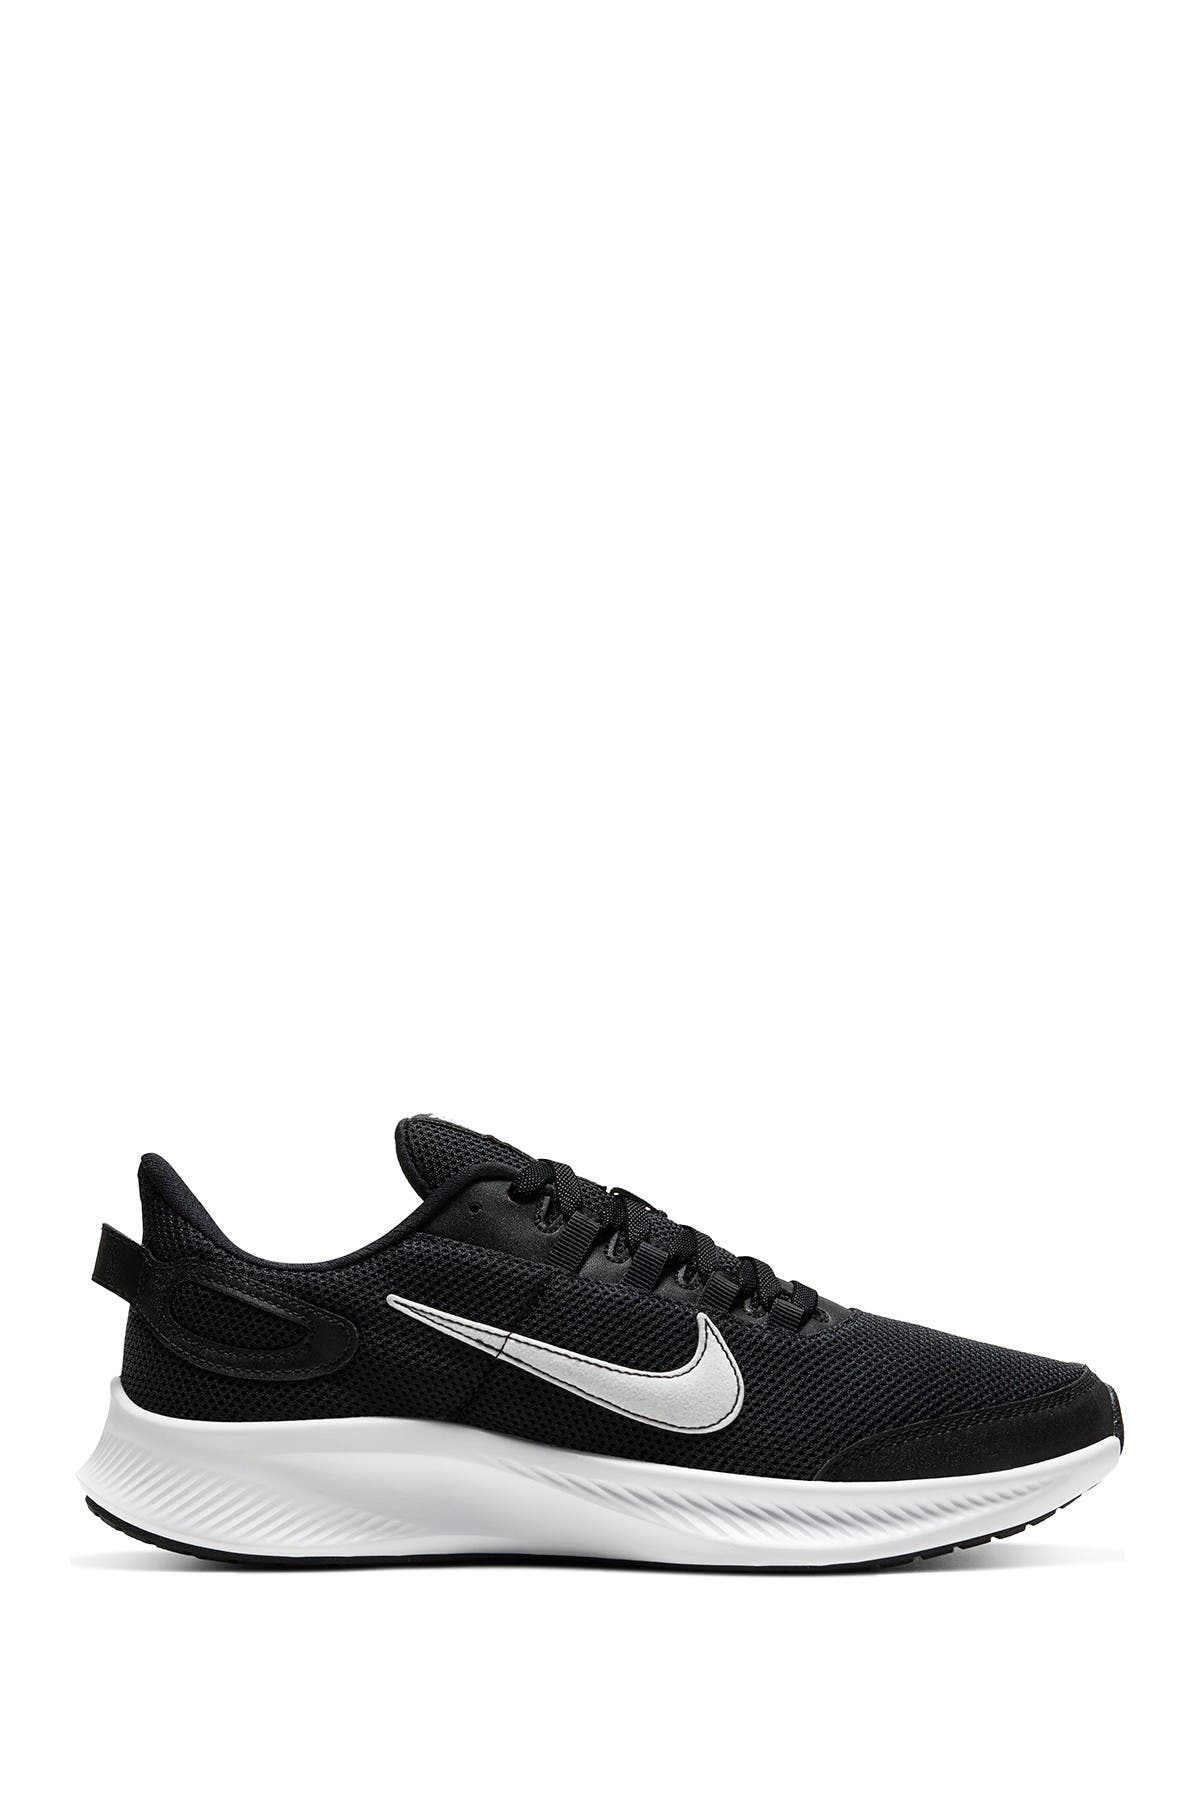 Nike | Run All Day 2 Running Shoe